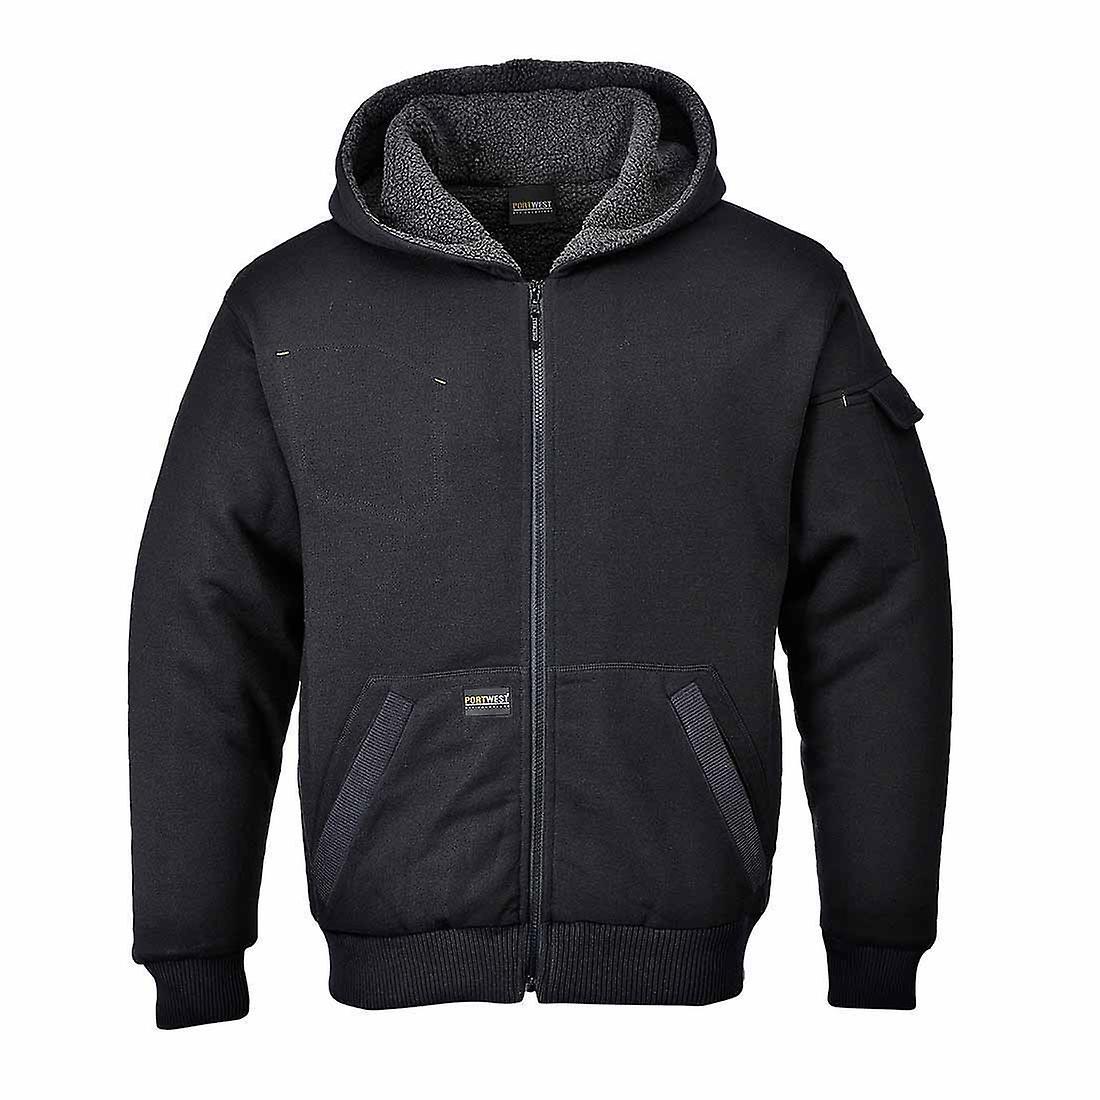 SUw - Pewter Classic vêtehommests de travail Sherpa Pile Lined veste With Hood